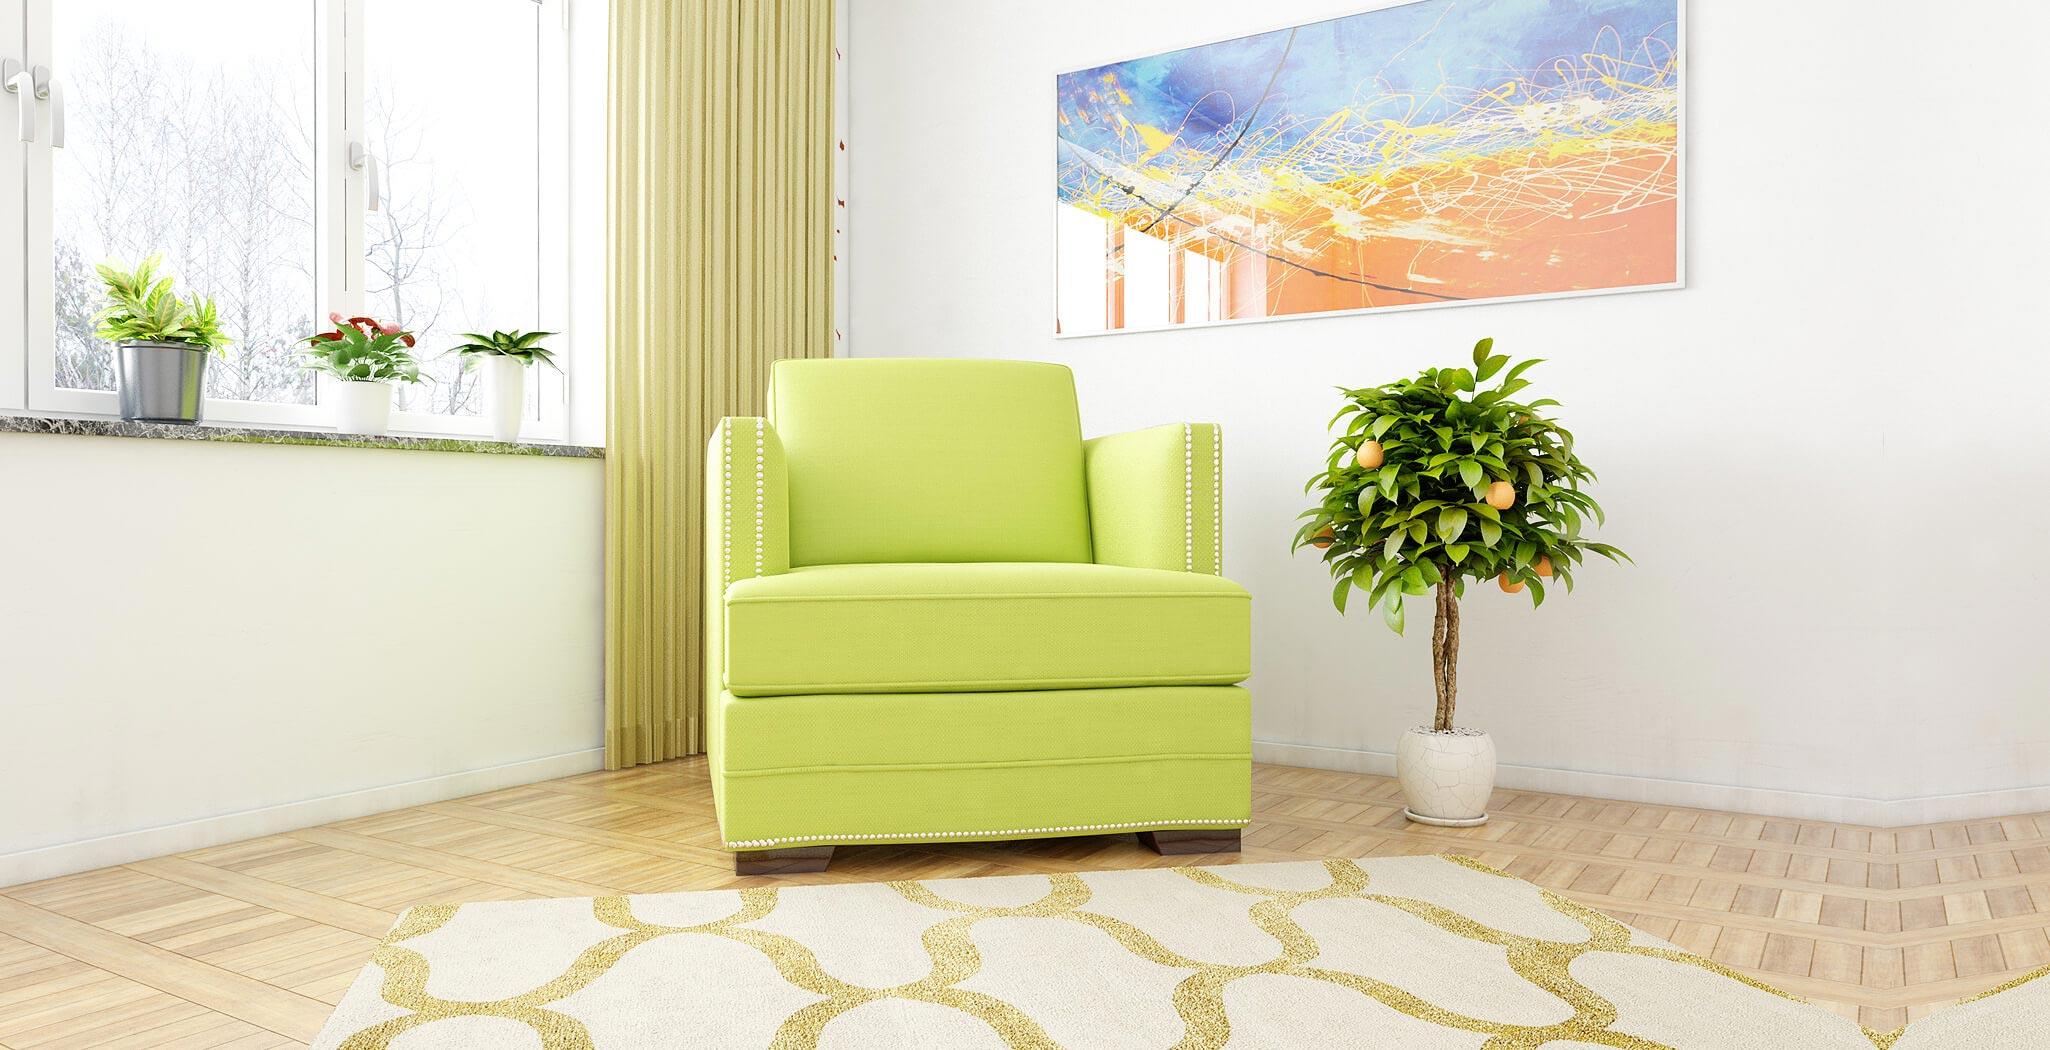 riga chair furniture gallery 3